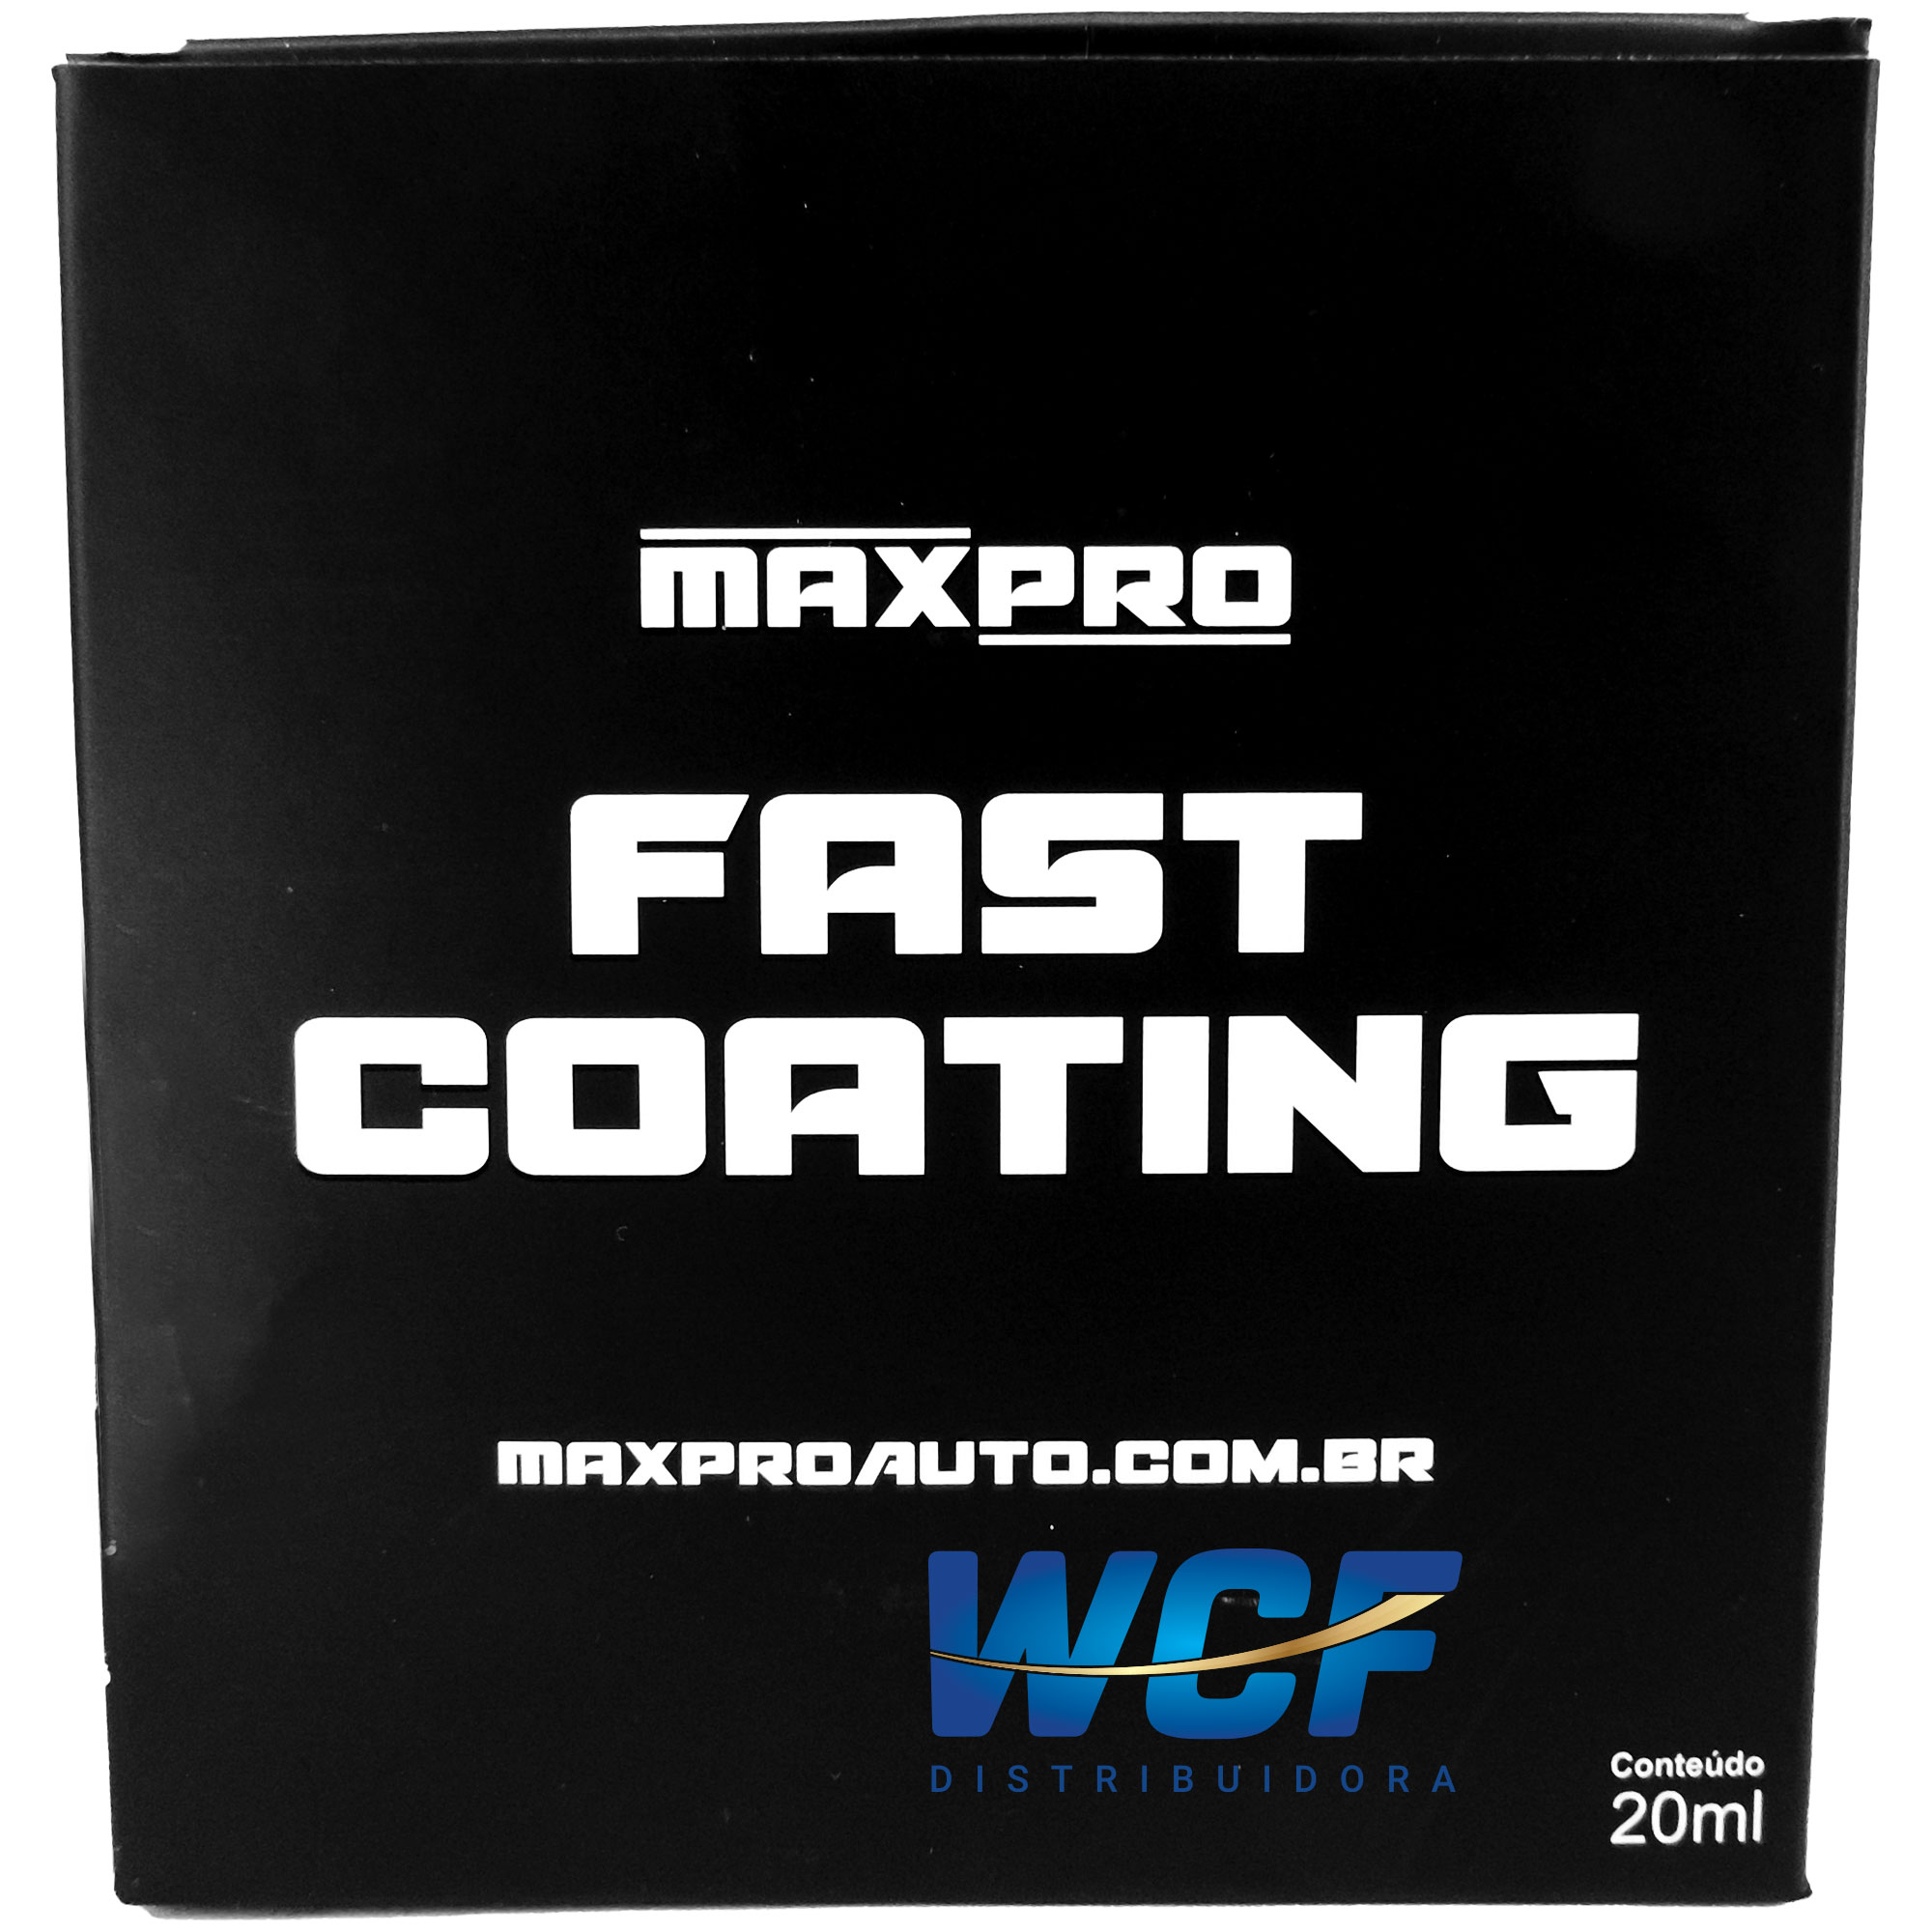 MAXPRO FAST COATING 20ML